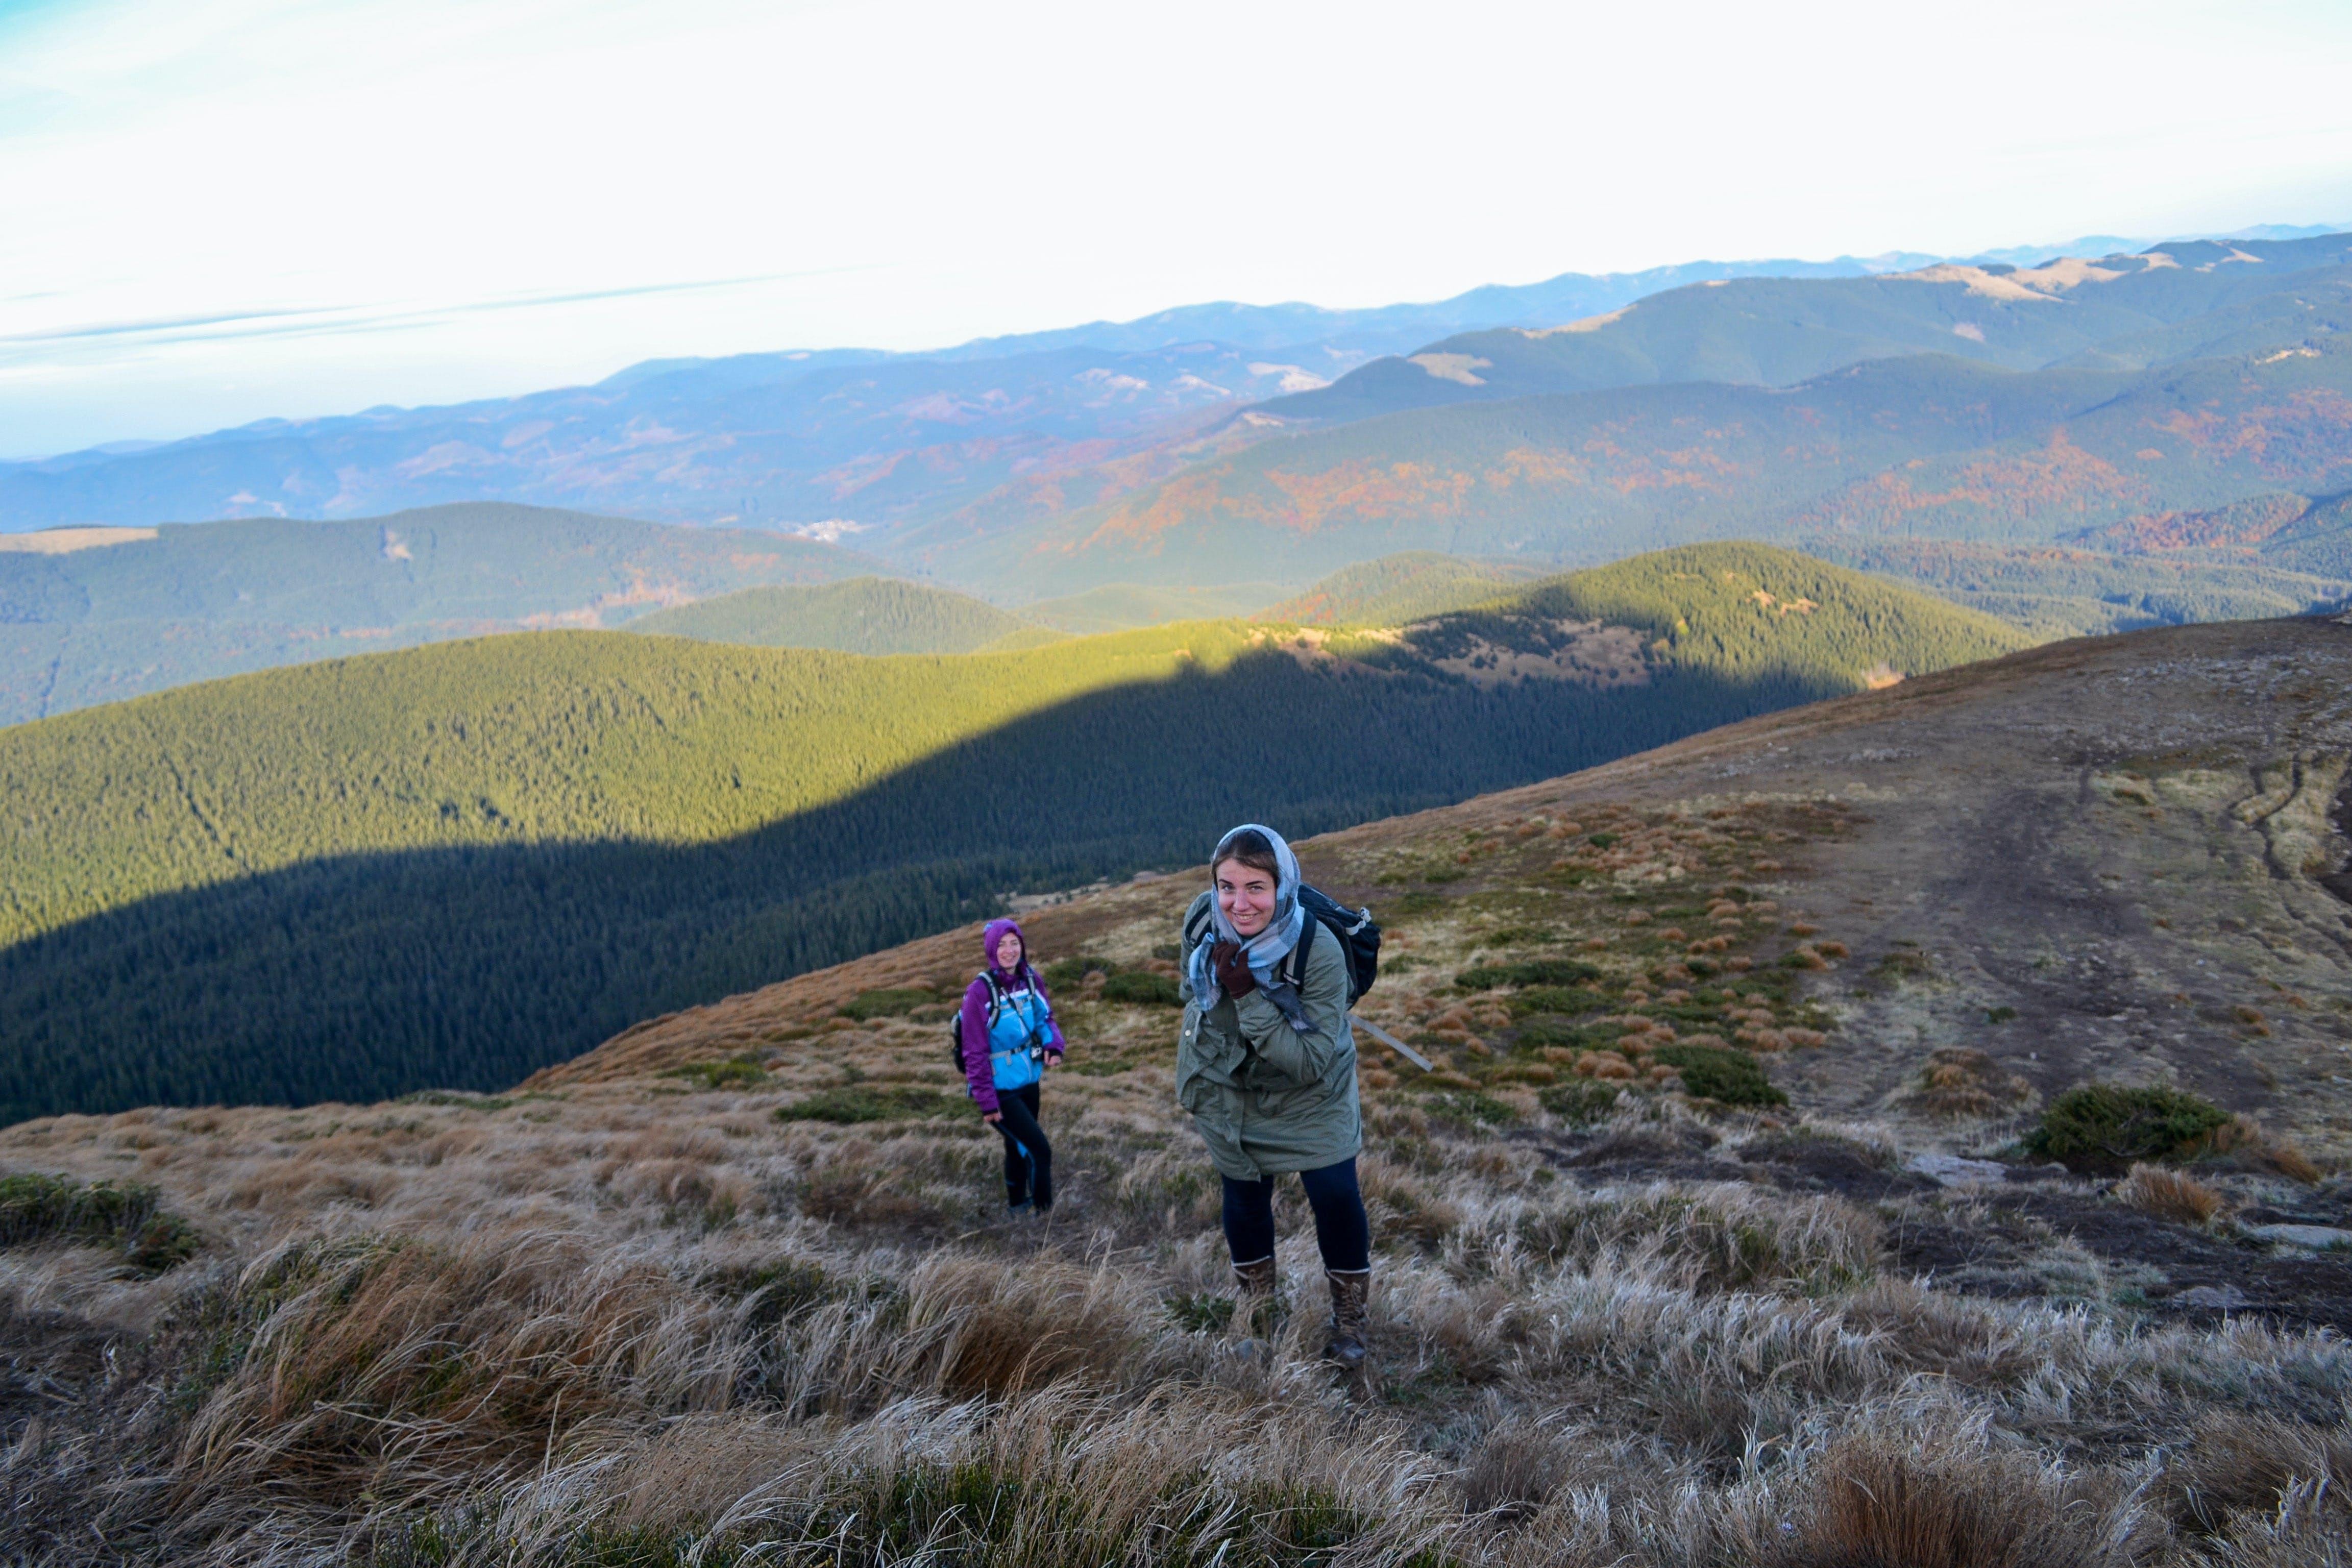 Two Women Trekking Up a Mountain